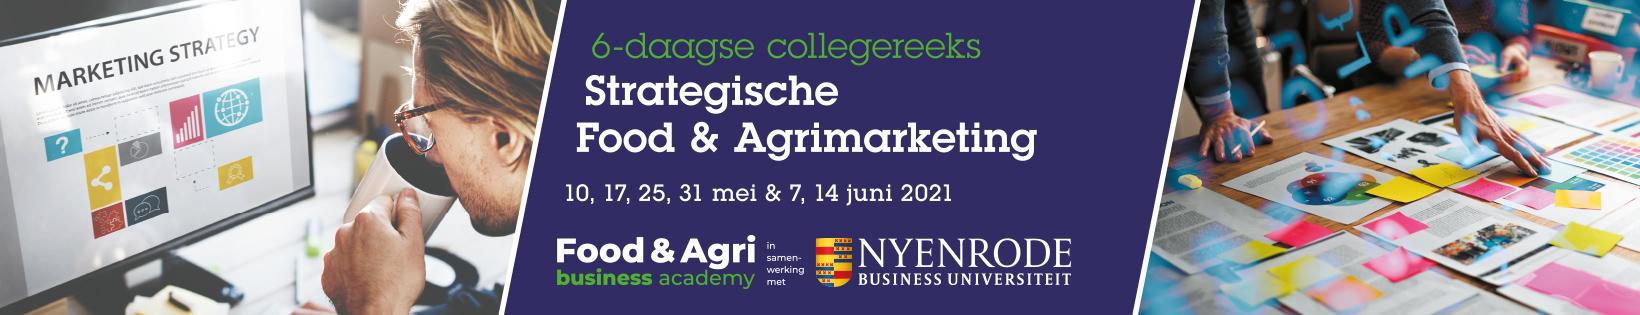 Strategische Food & Agrimarketing